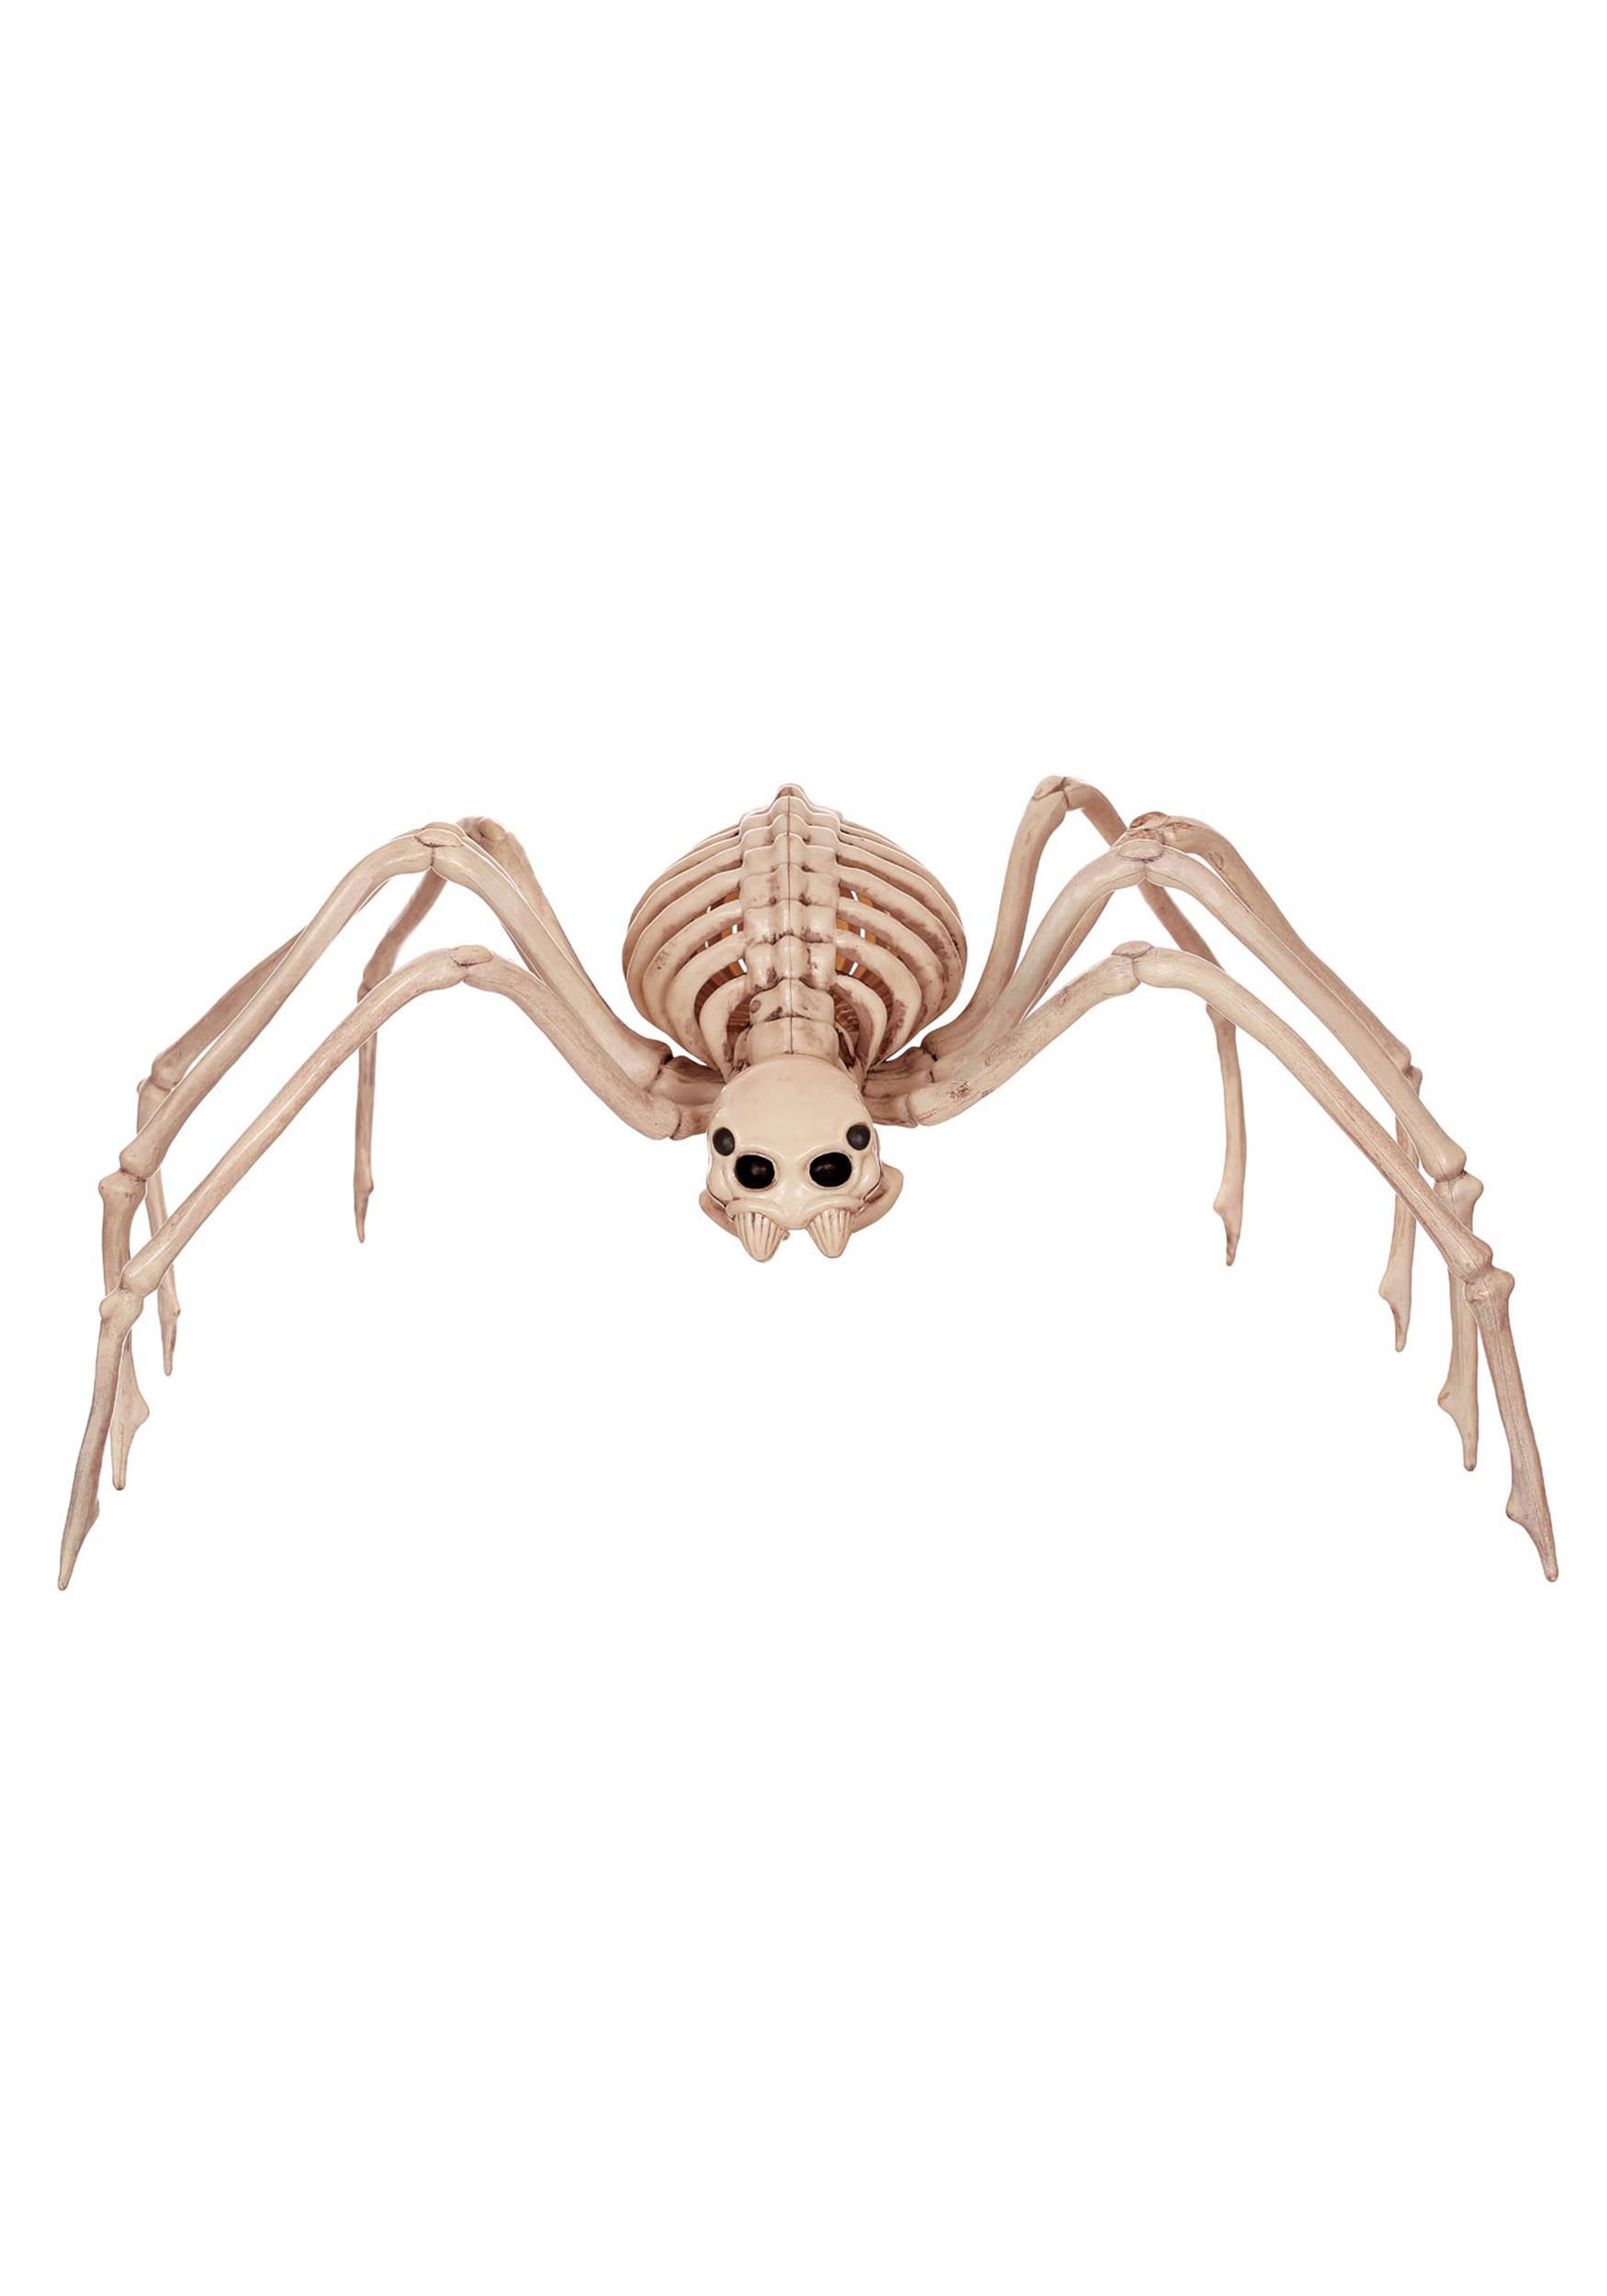 Halloween Spider Webs and Plastic Spiders - Spiderweb Decorations